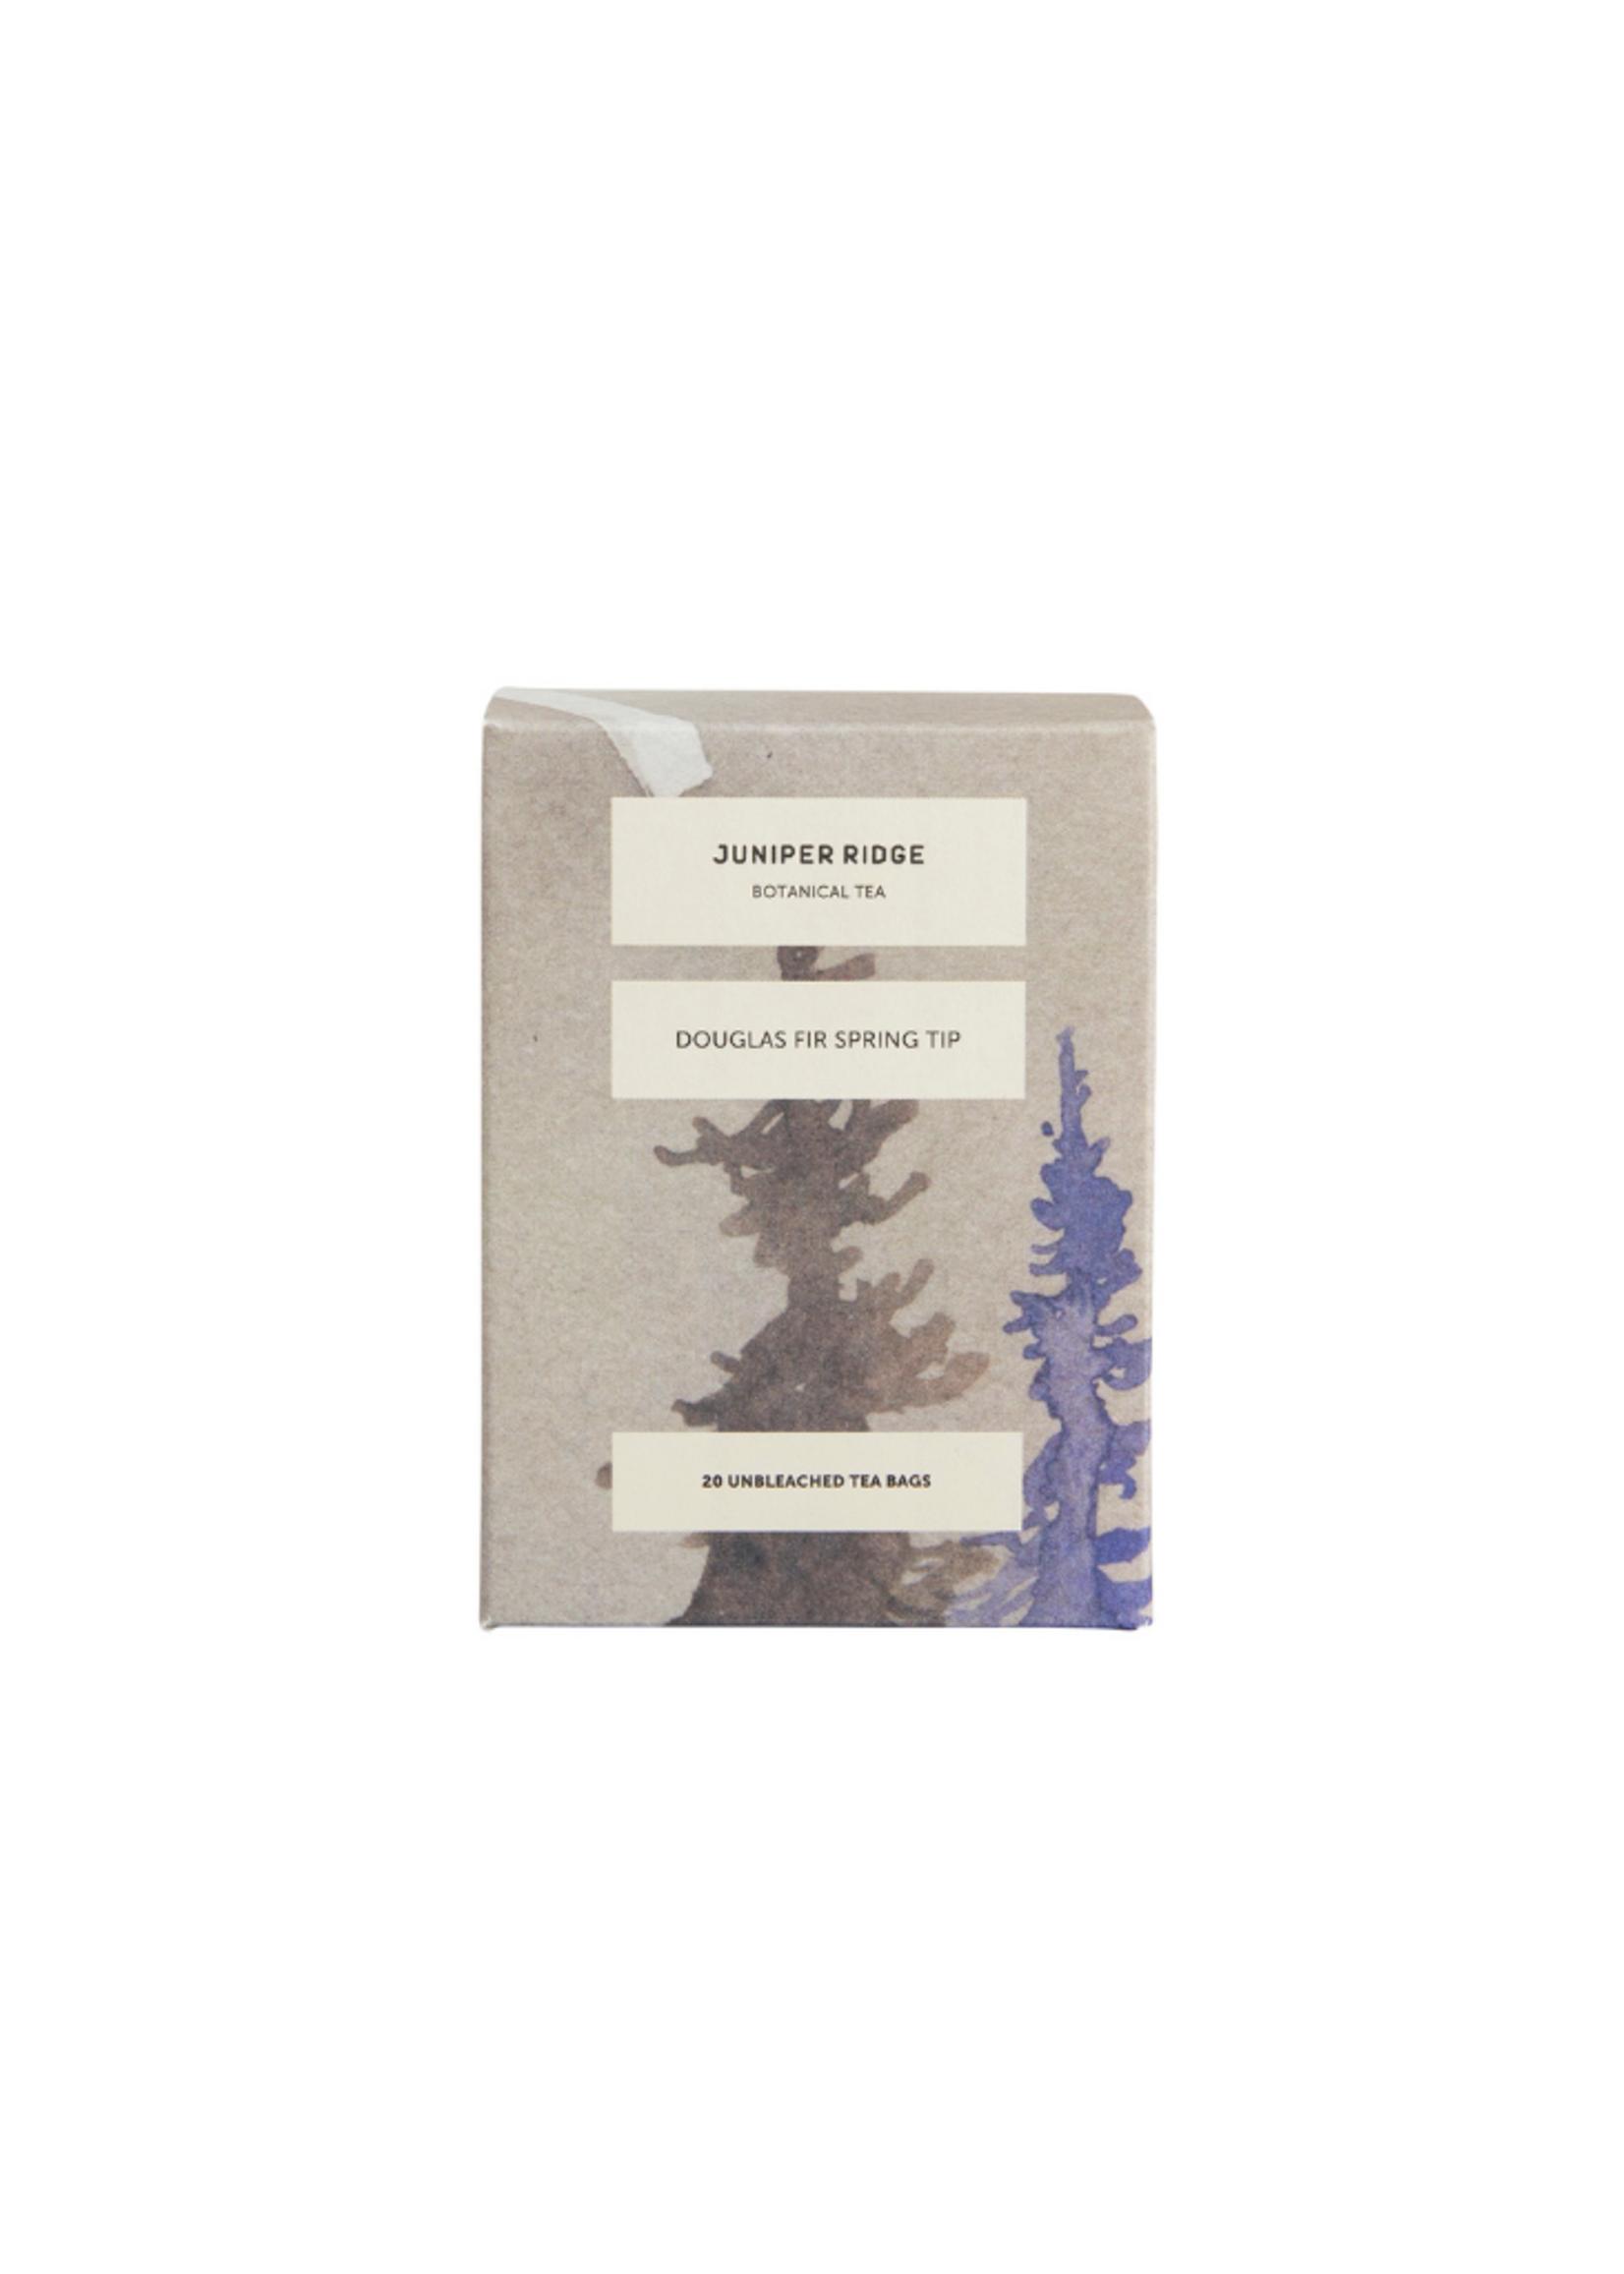 Juniper Ridge  Douglas Fir Spring Tip Botanical Tea